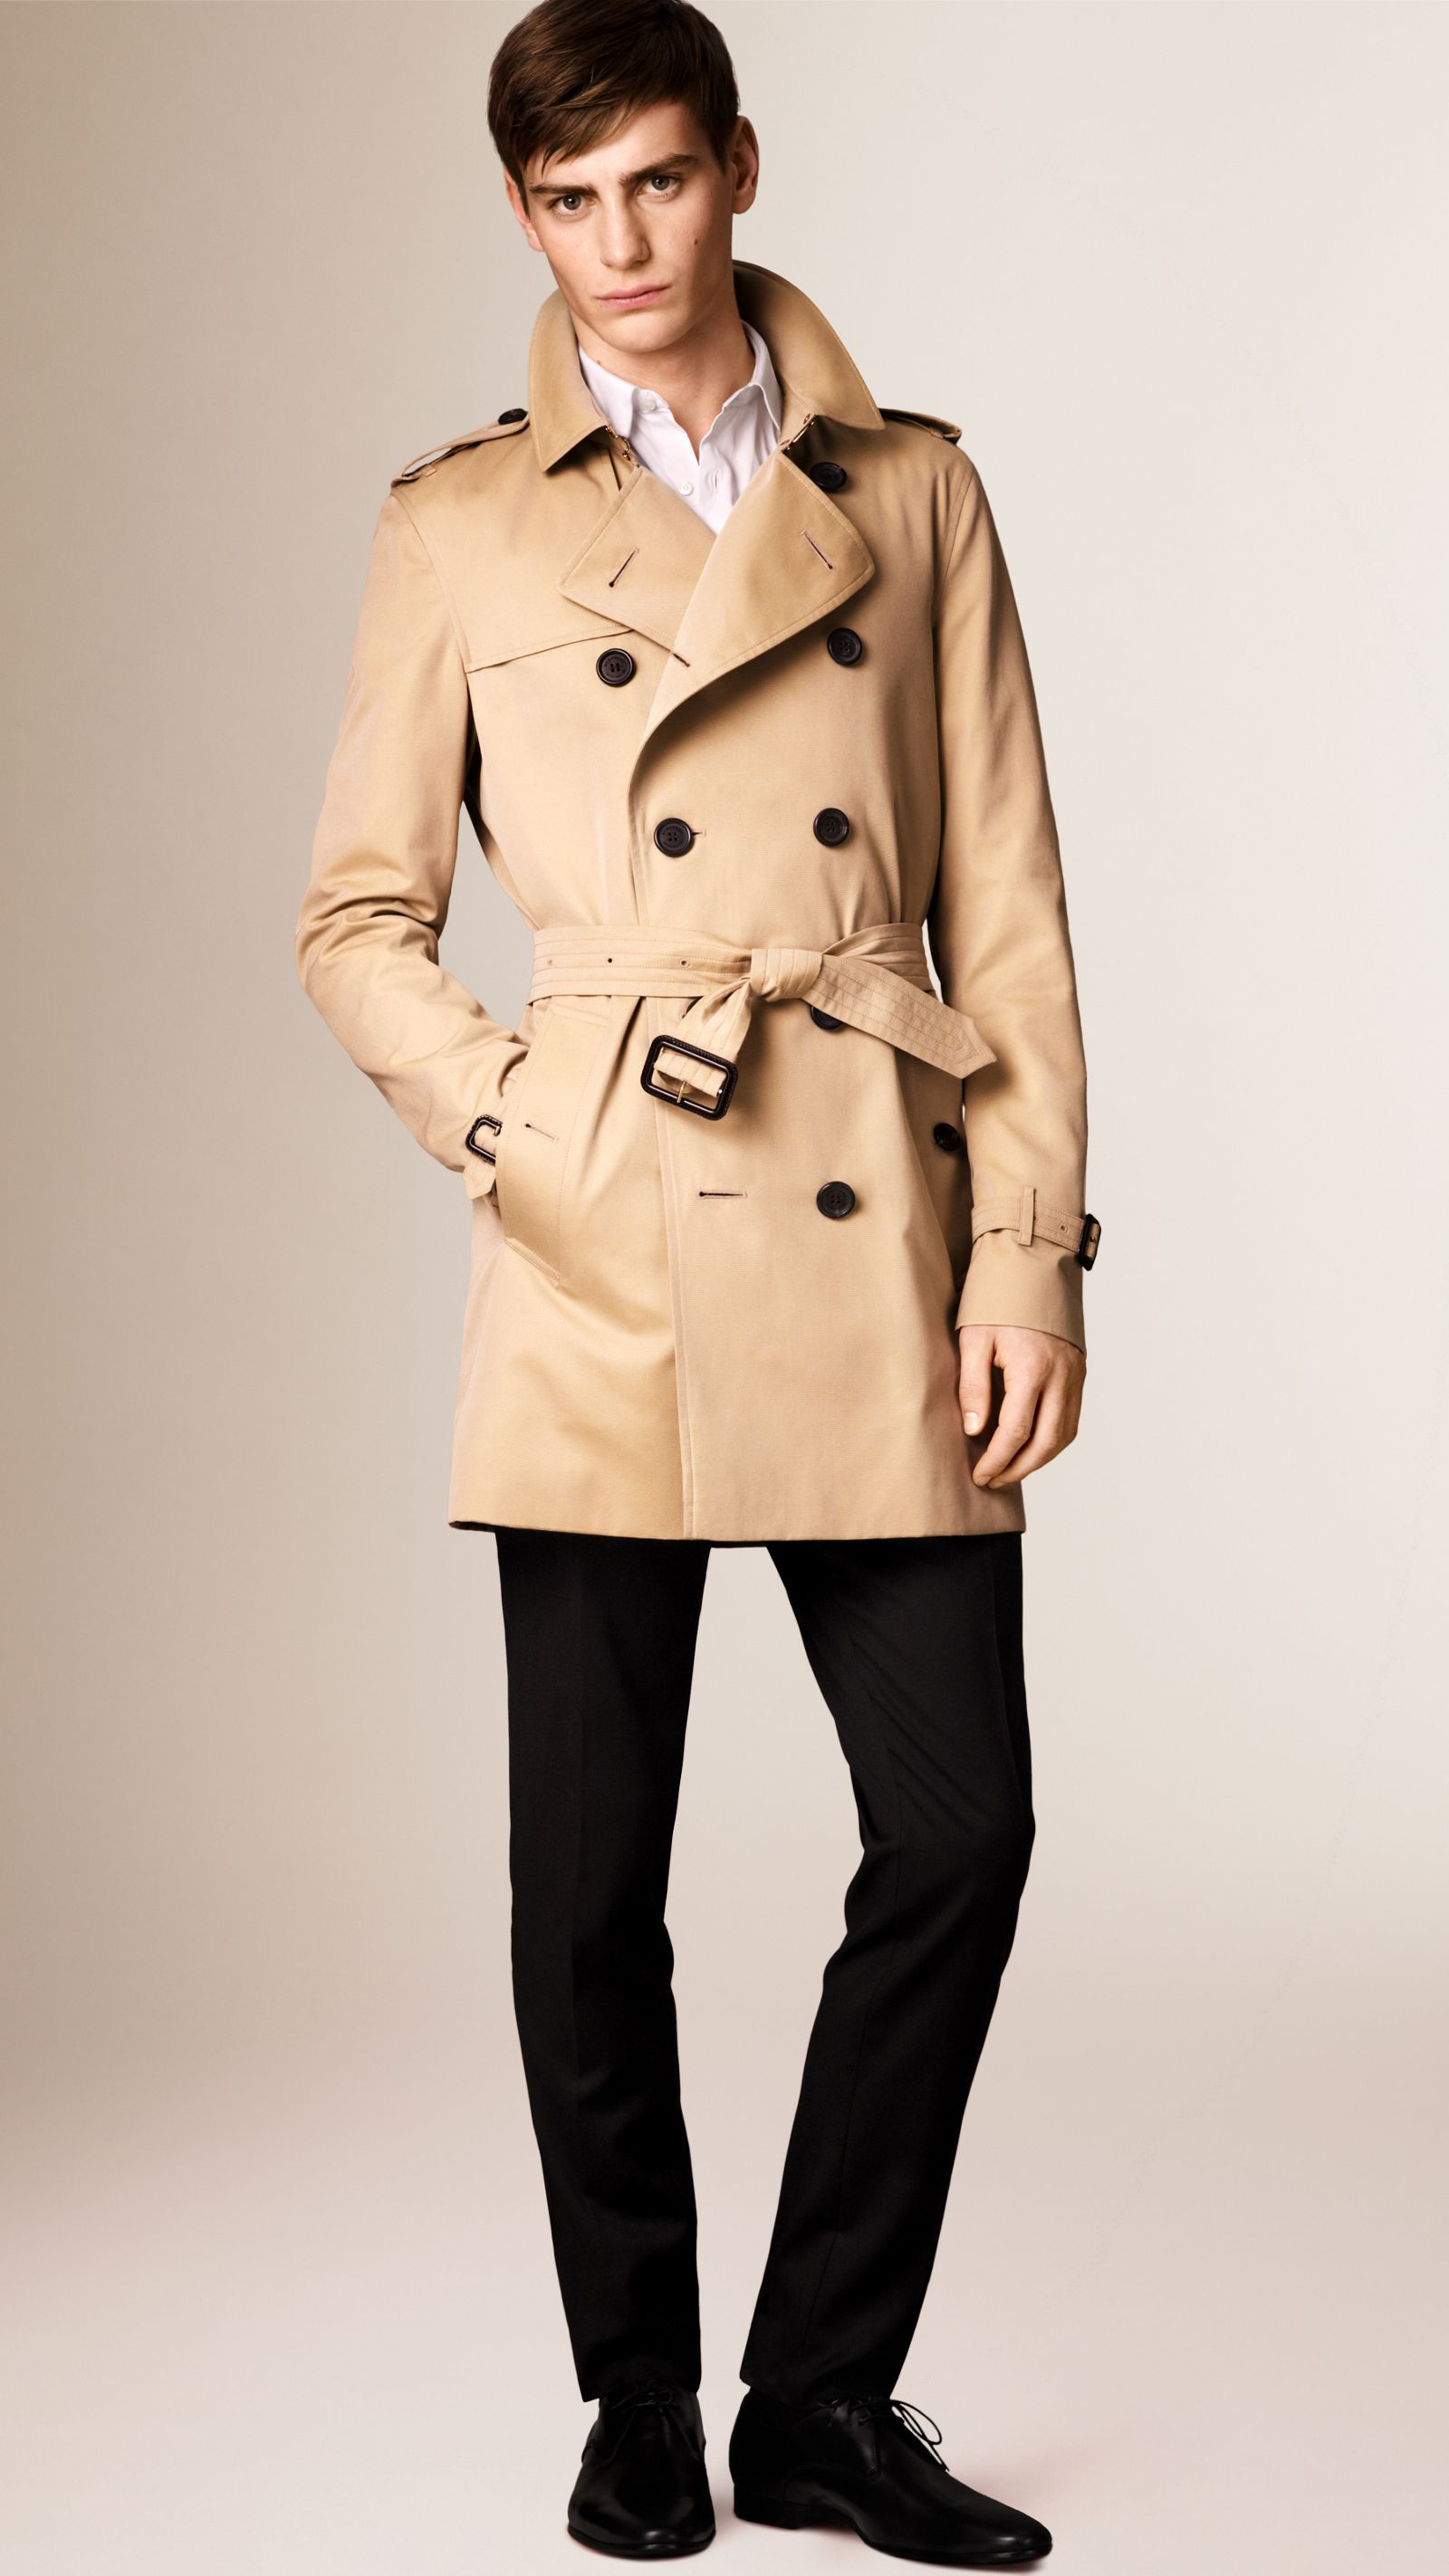 b31f5c4a8b0f The Kensington – Mid-length Trench Coat in Honey - Men